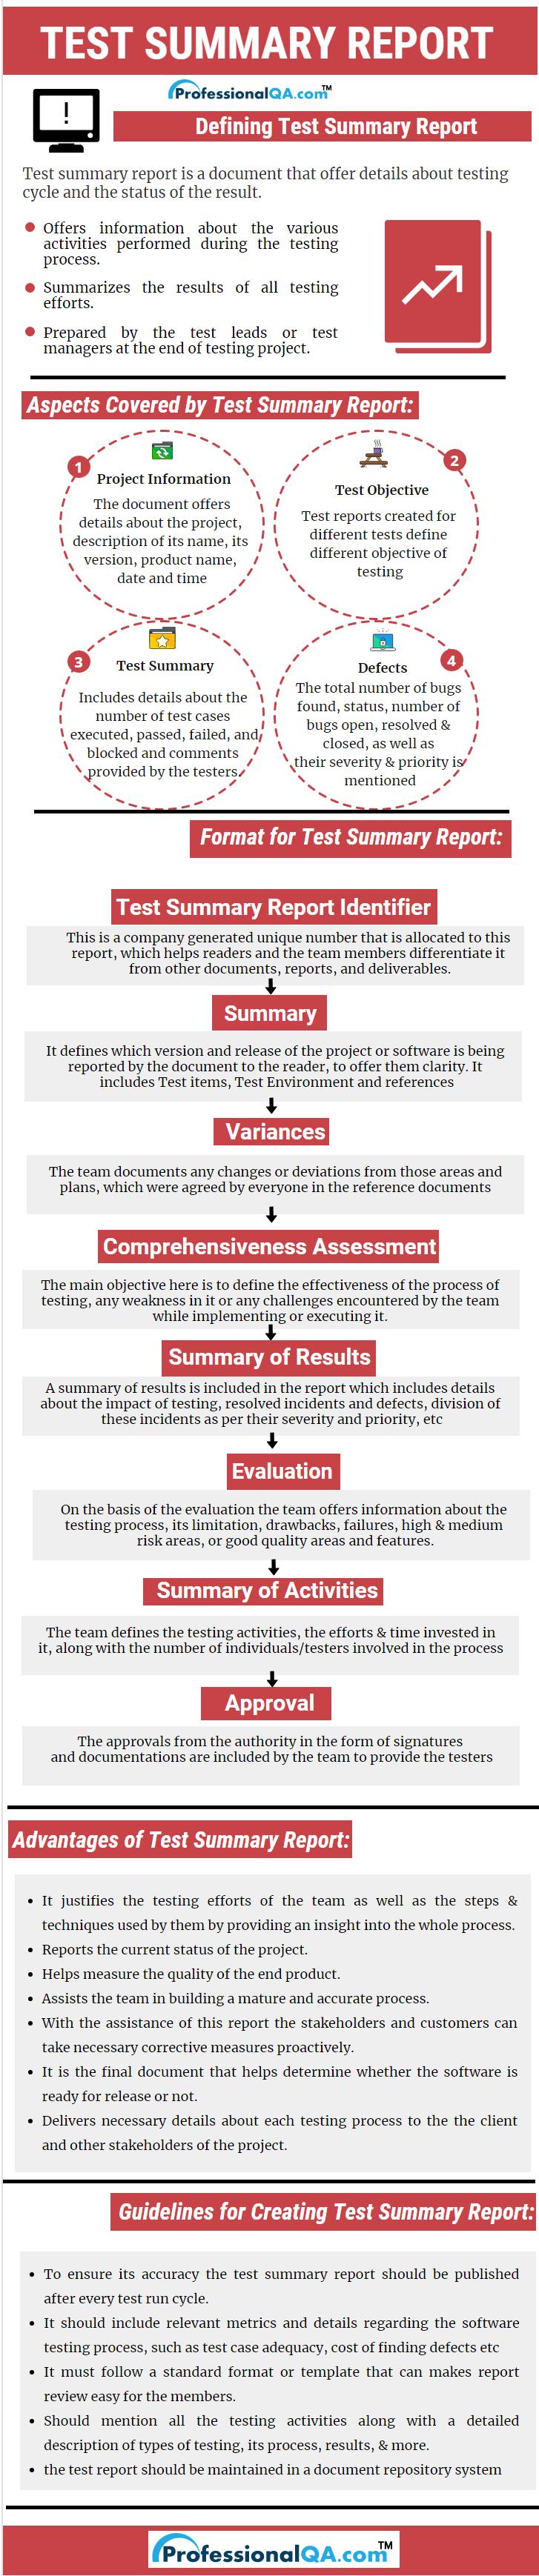 Test Summary Report Professionalqa Regarding Test Result Report Template